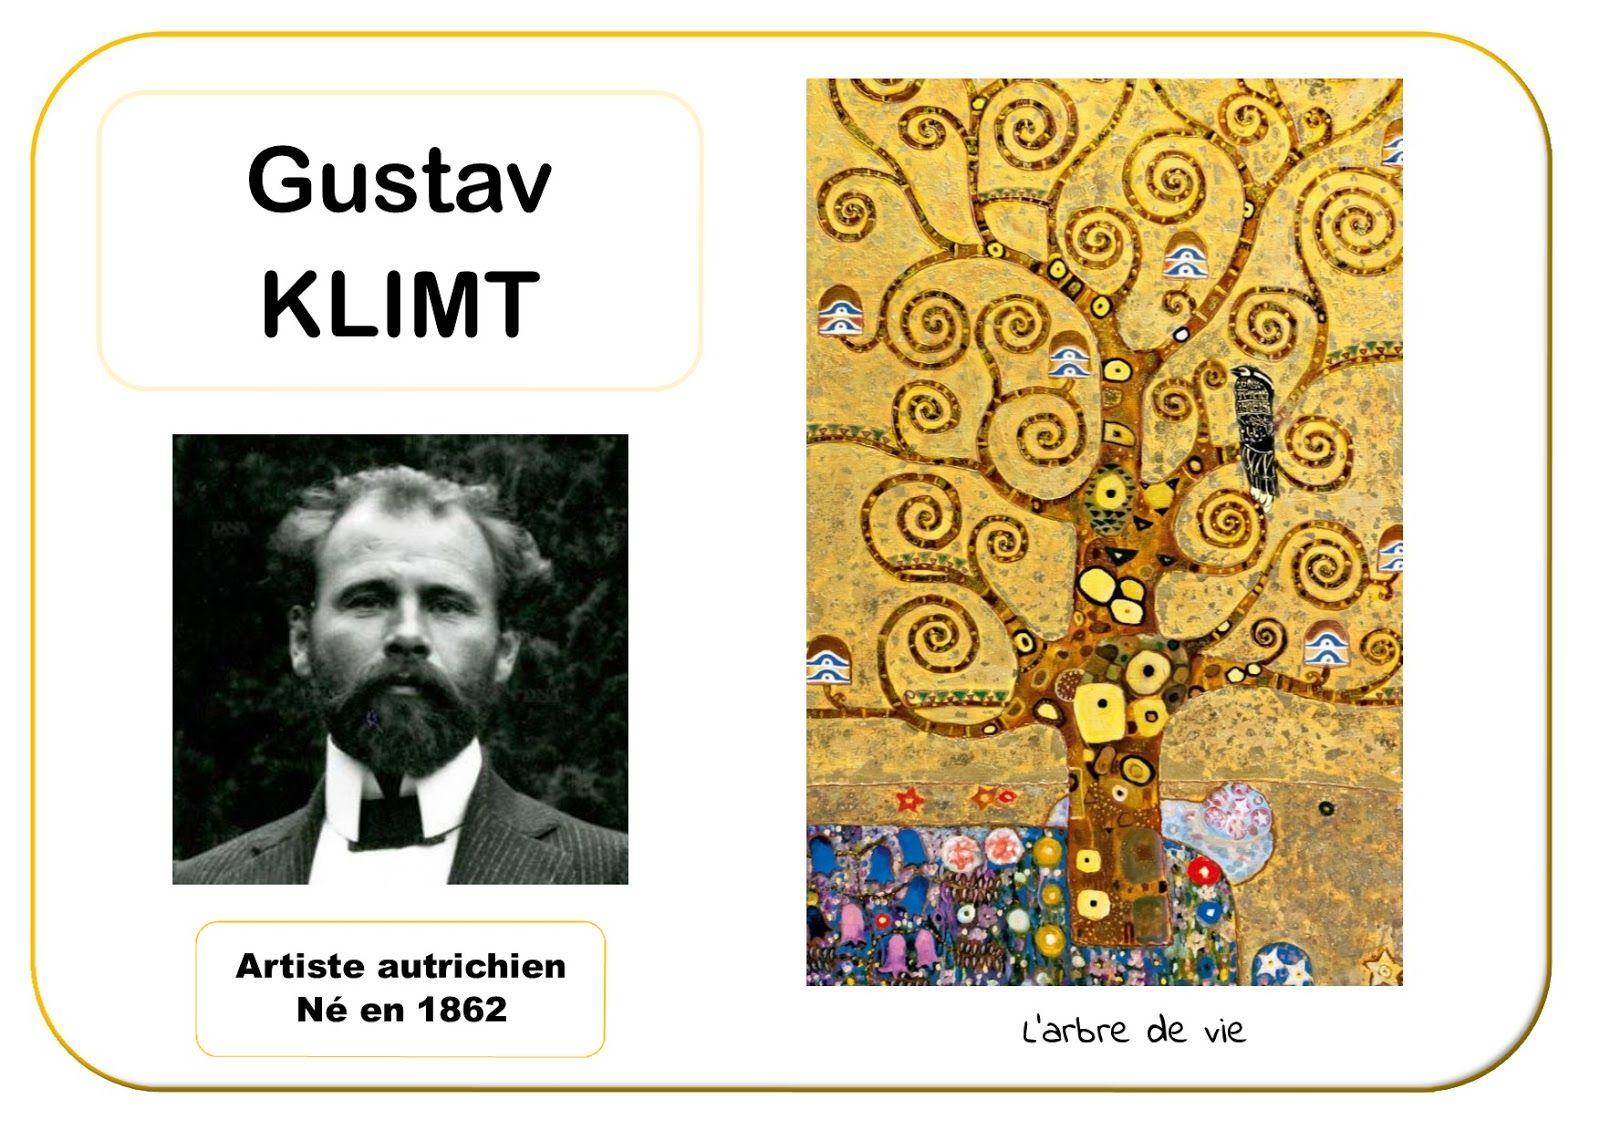 Gustav klimt portrait d 39 artiste inspiration d 39 artistes for Biographie de klimt